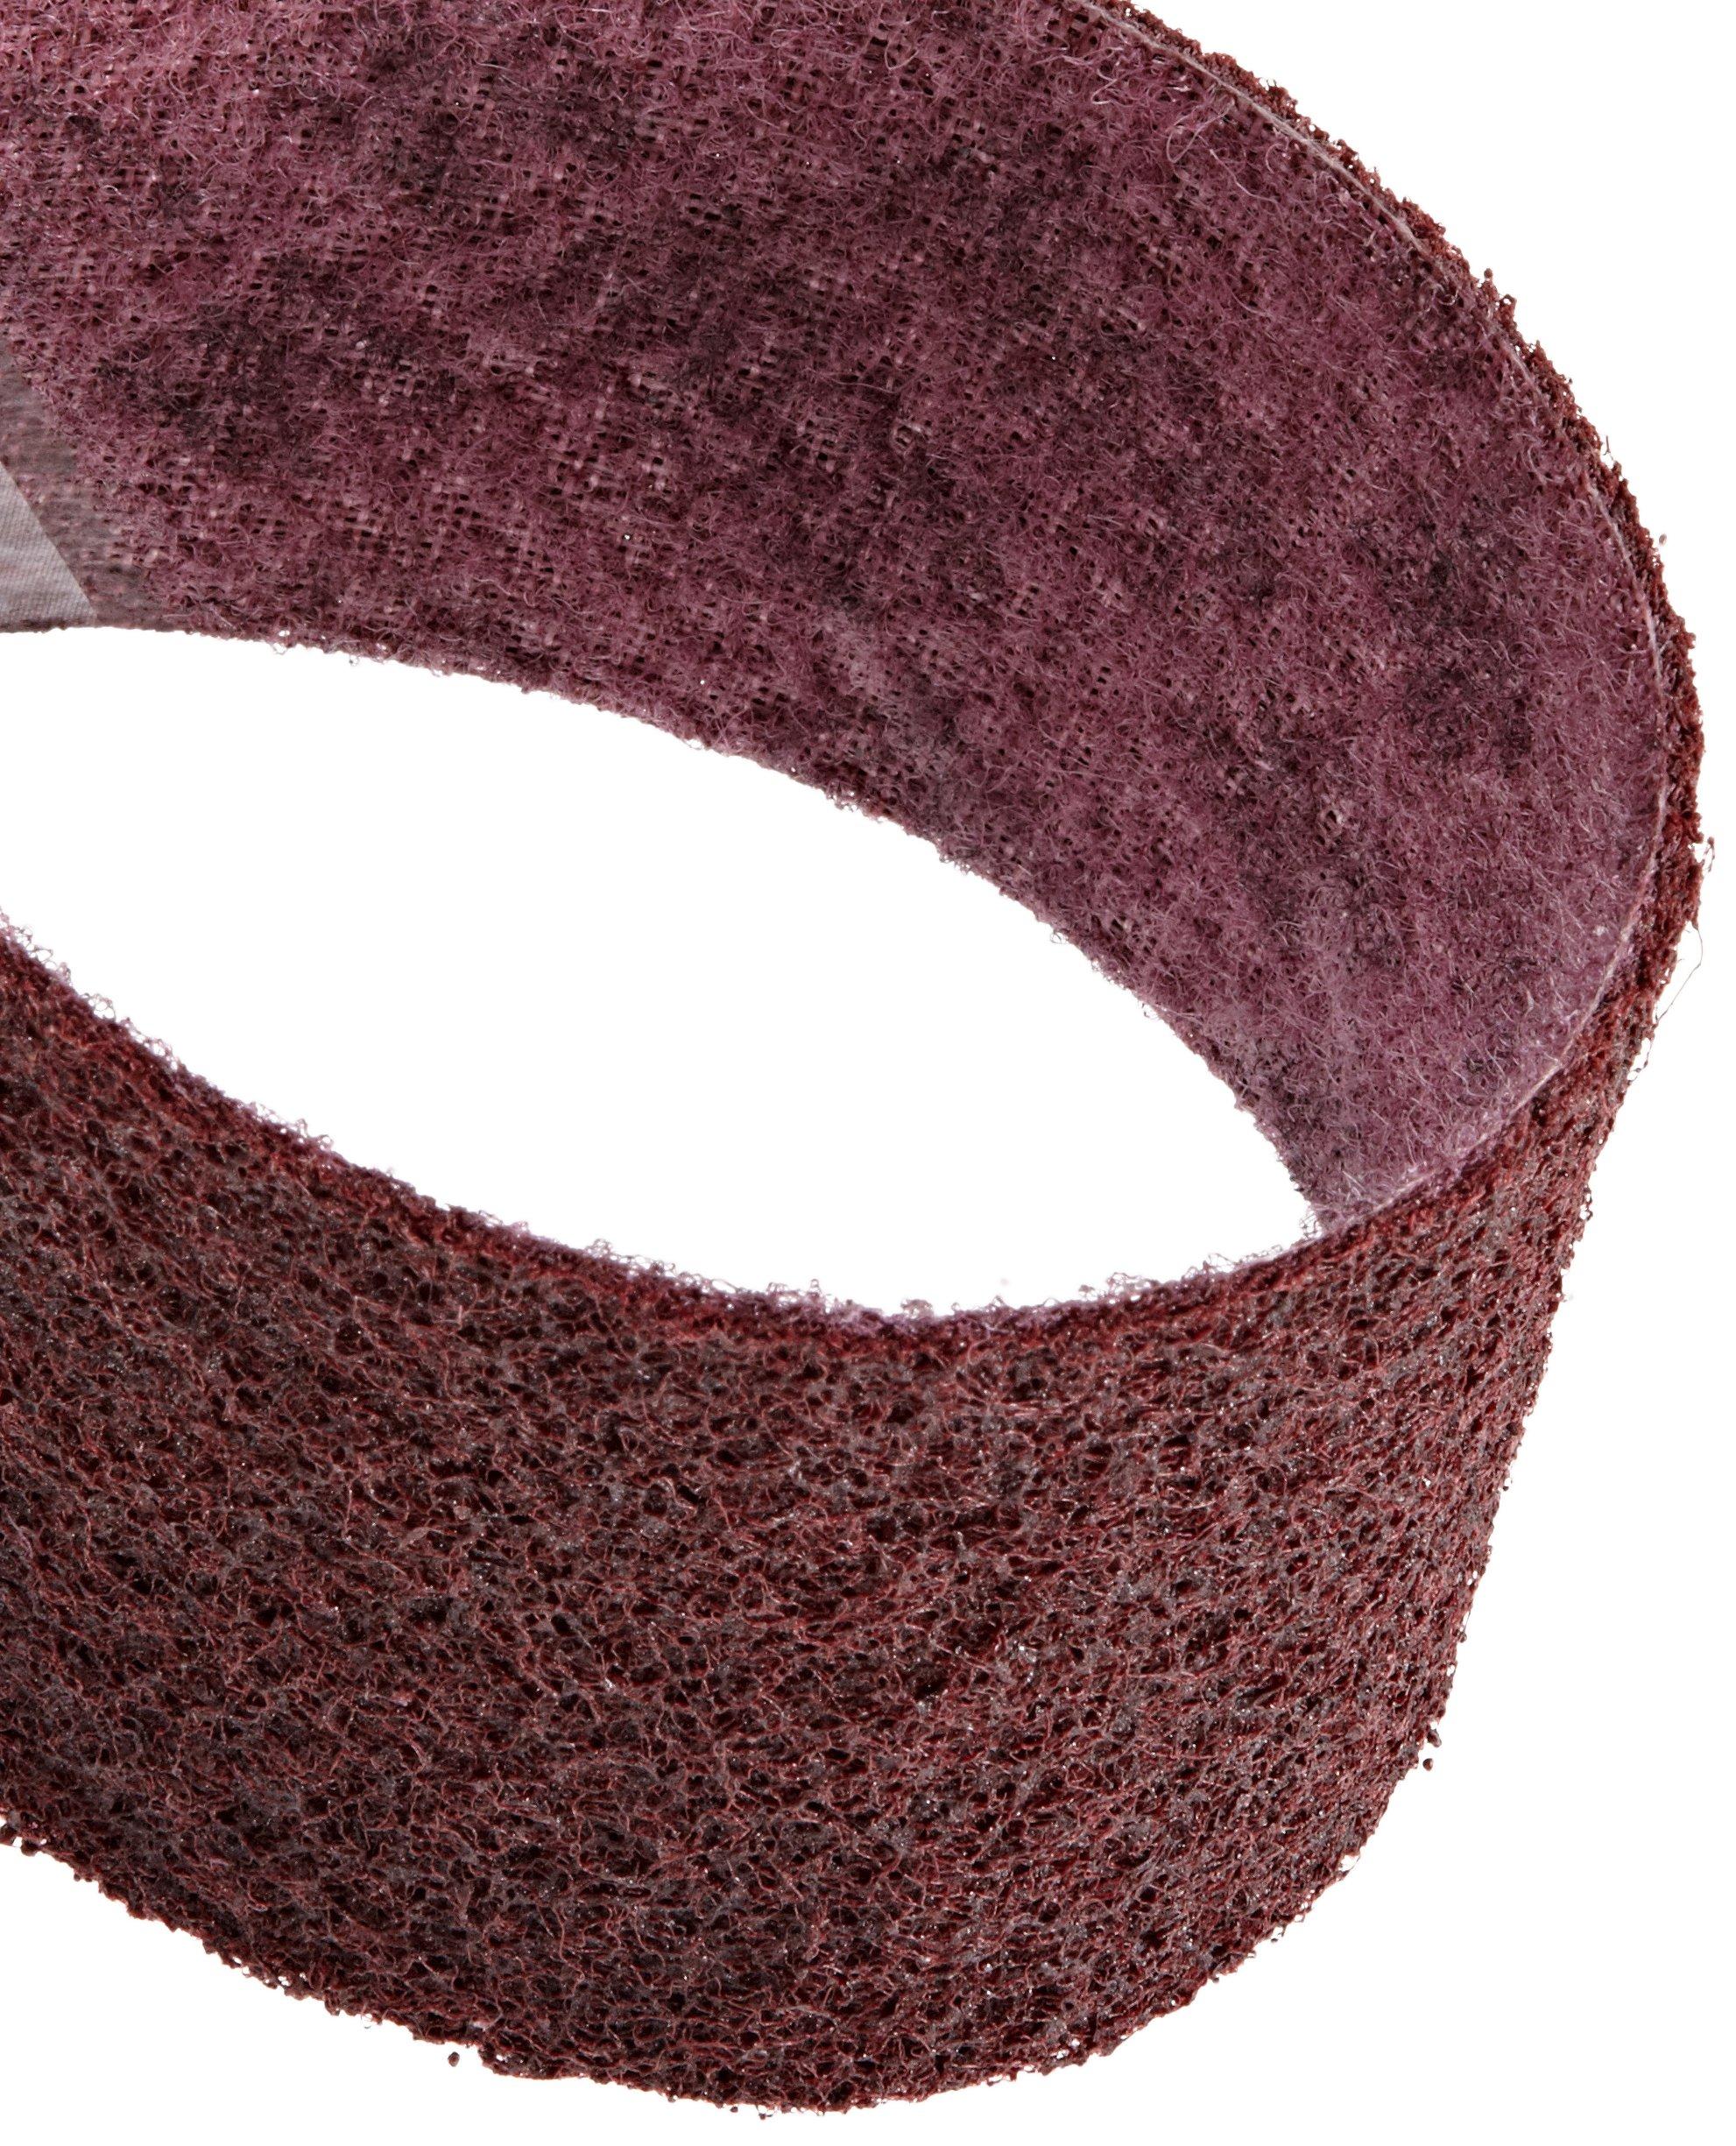 Scotch-Brite(TM) Surface Conditioning Belt, 3-1/2 Width x 15-1/2 Length, Medium, Maroon (Pack of 10)